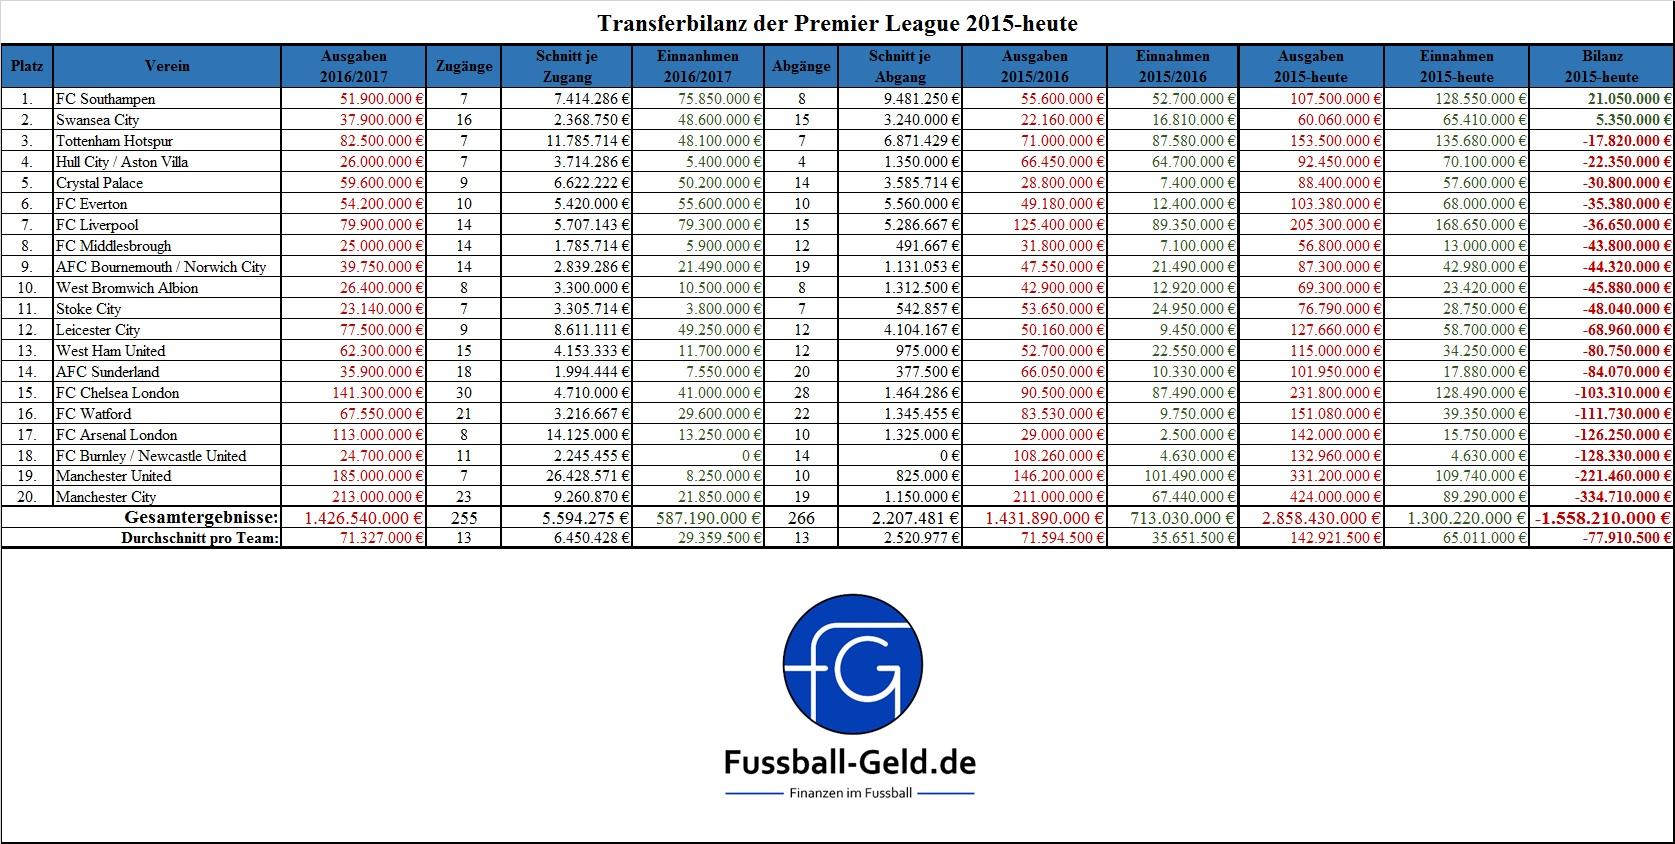 transferbilanz-premier-league